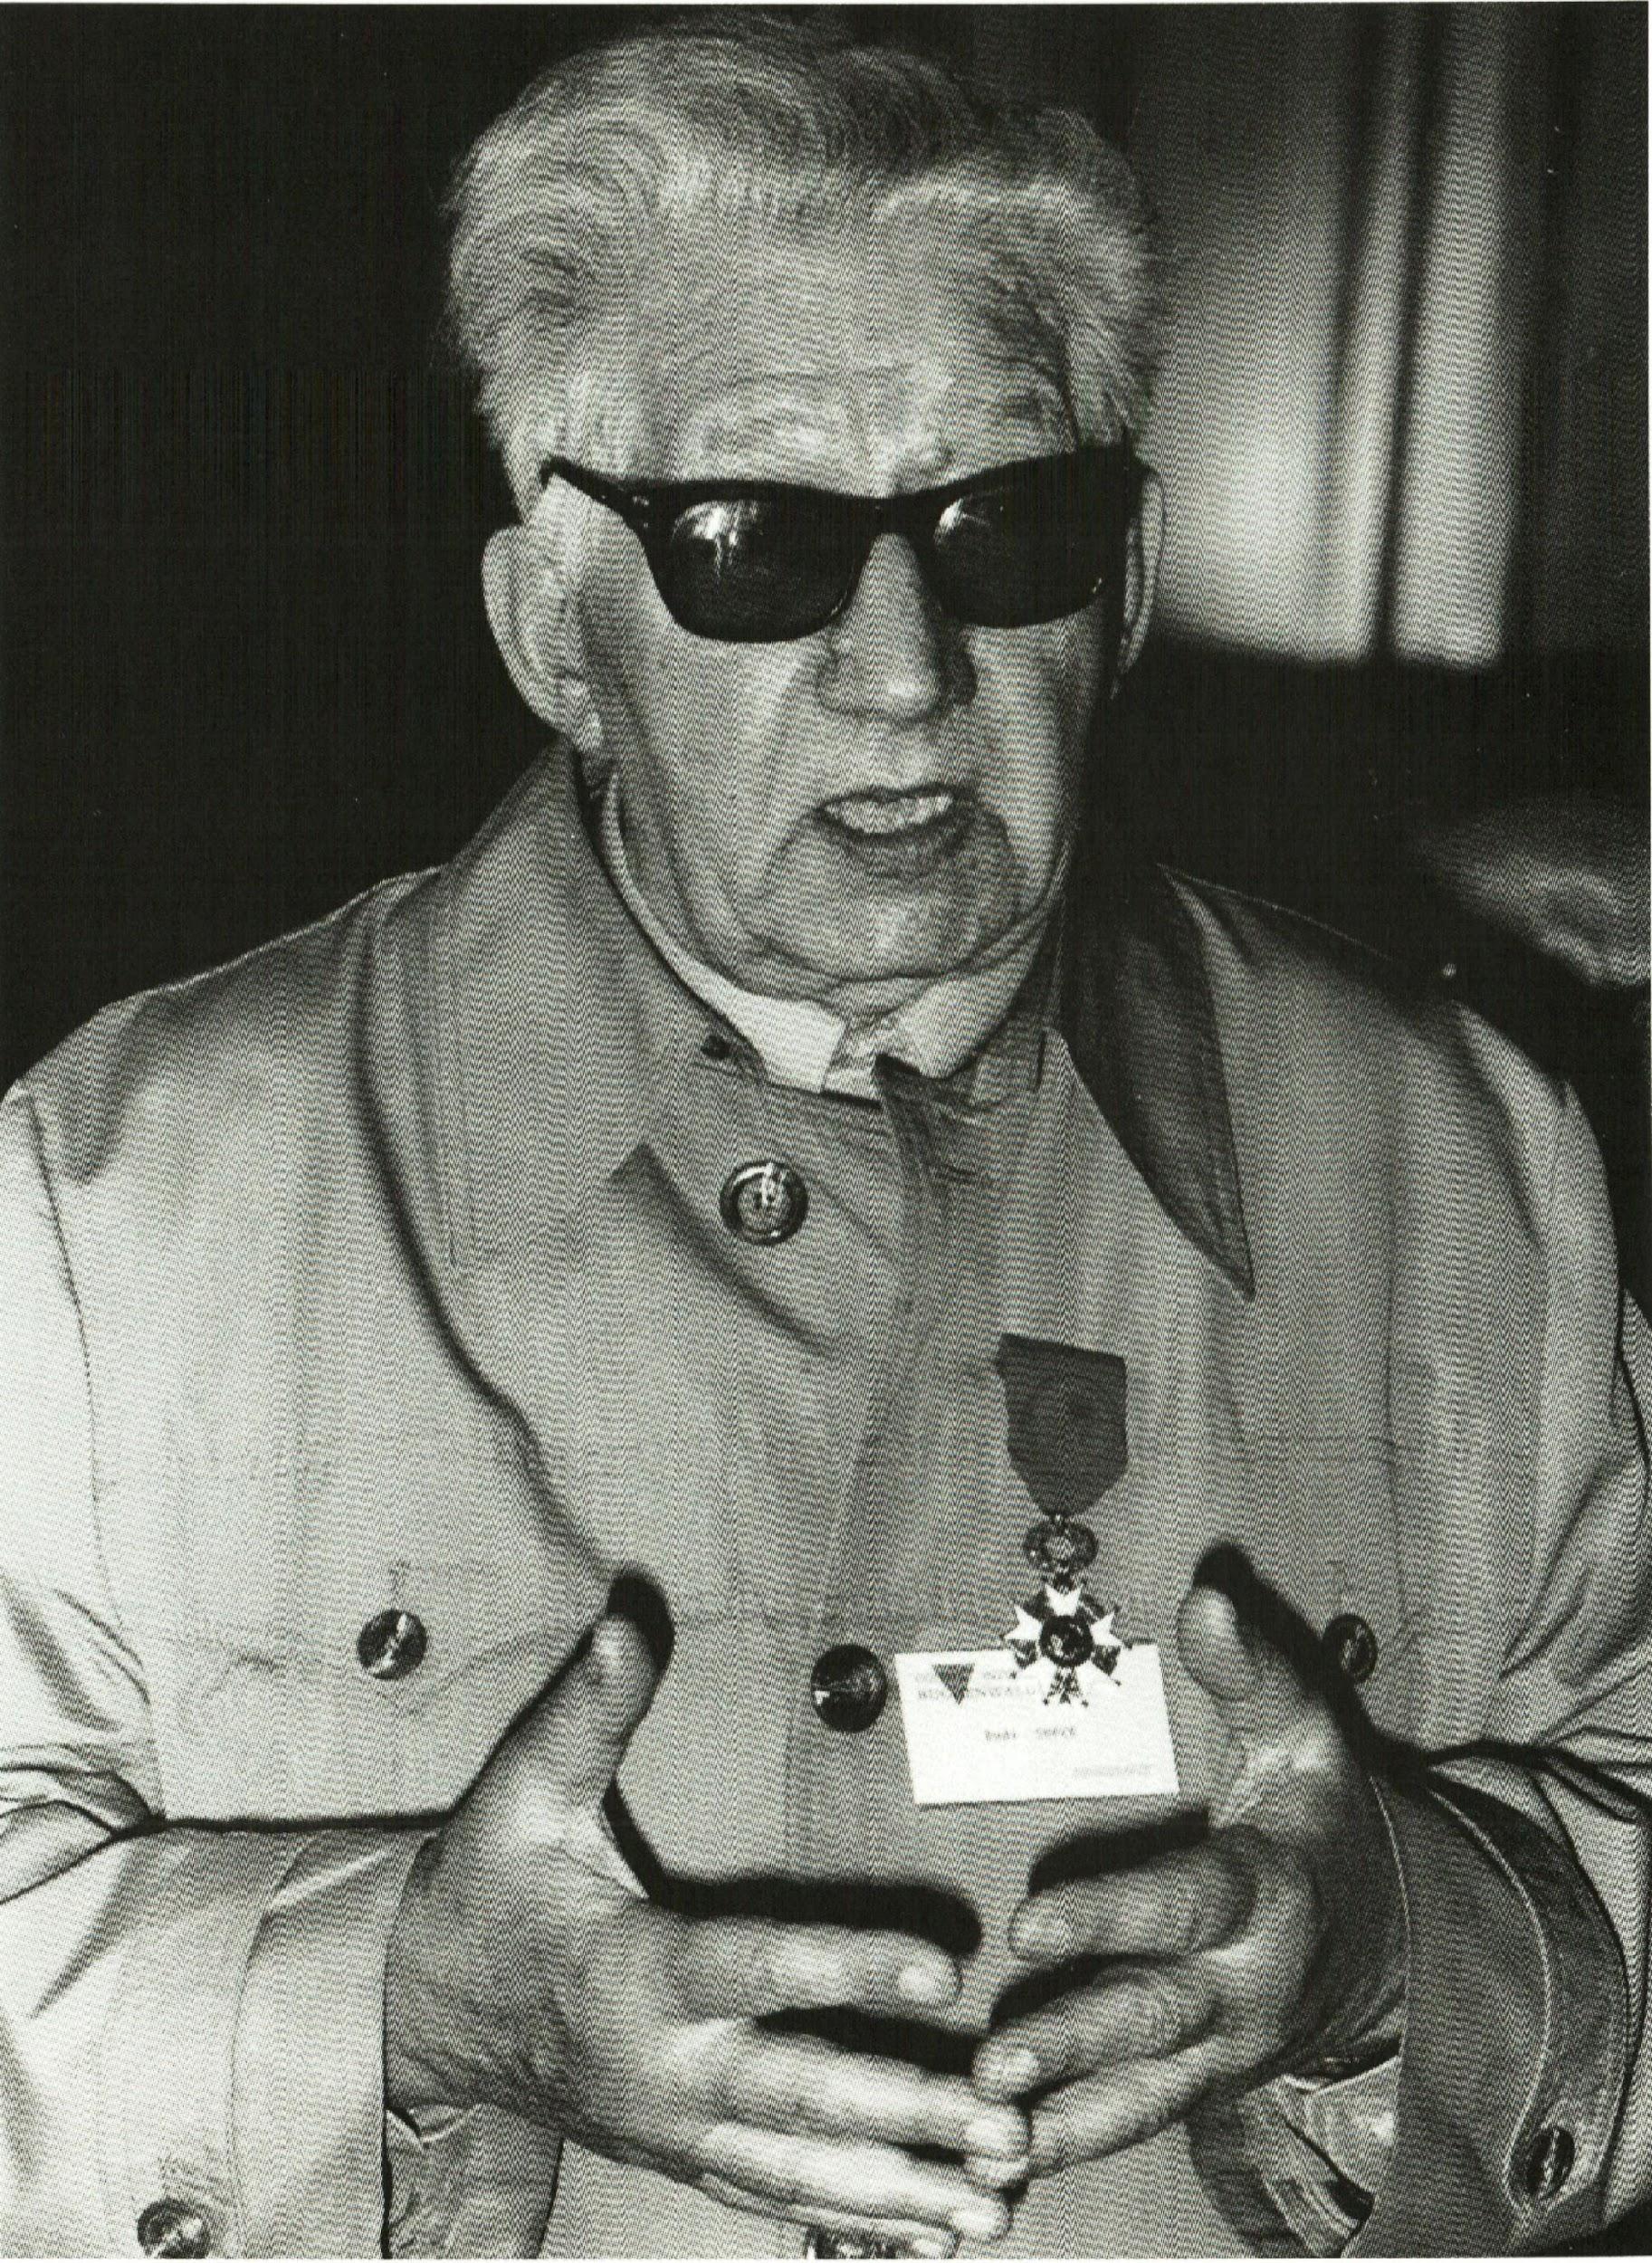 Rudi Supek s najvećim francuskim odličjem – Ordenom Legije časti, 1989.